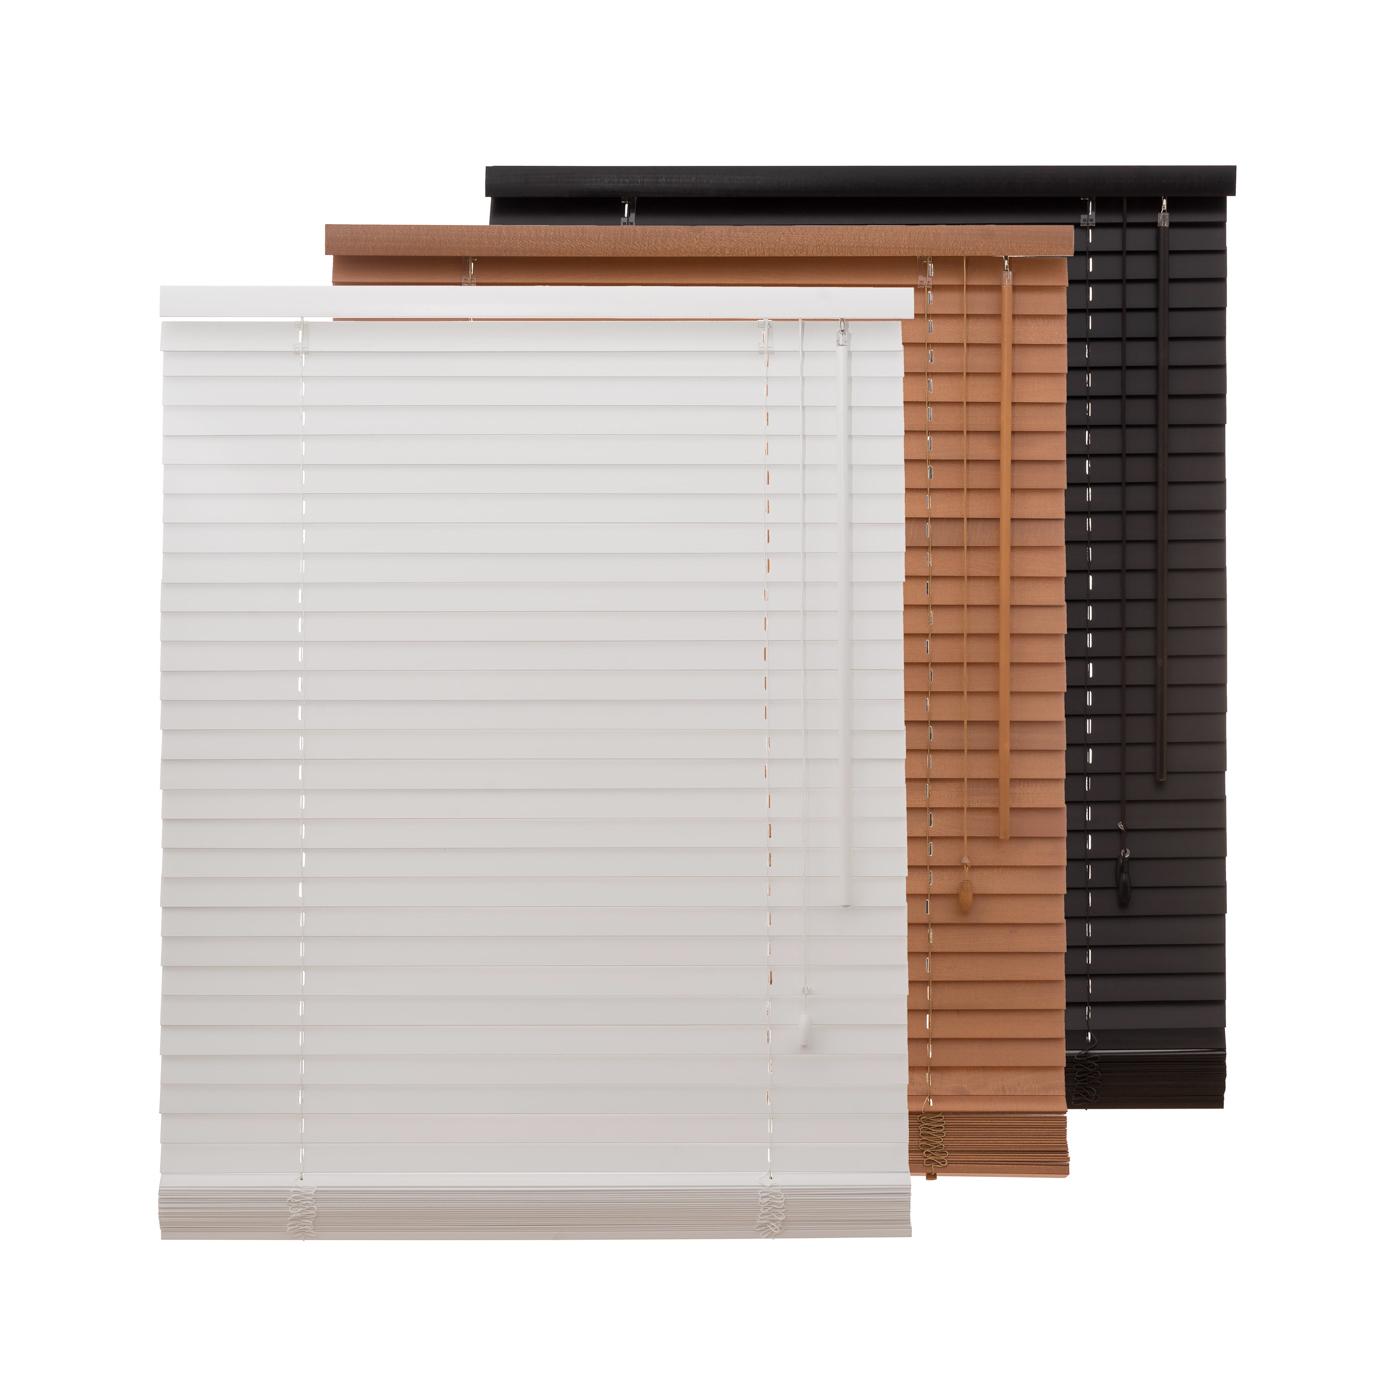 jalousie holzjalousie holz rollo plissee echtholz holzrollo lamelle 35mm ebay. Black Bedroom Furniture Sets. Home Design Ideas